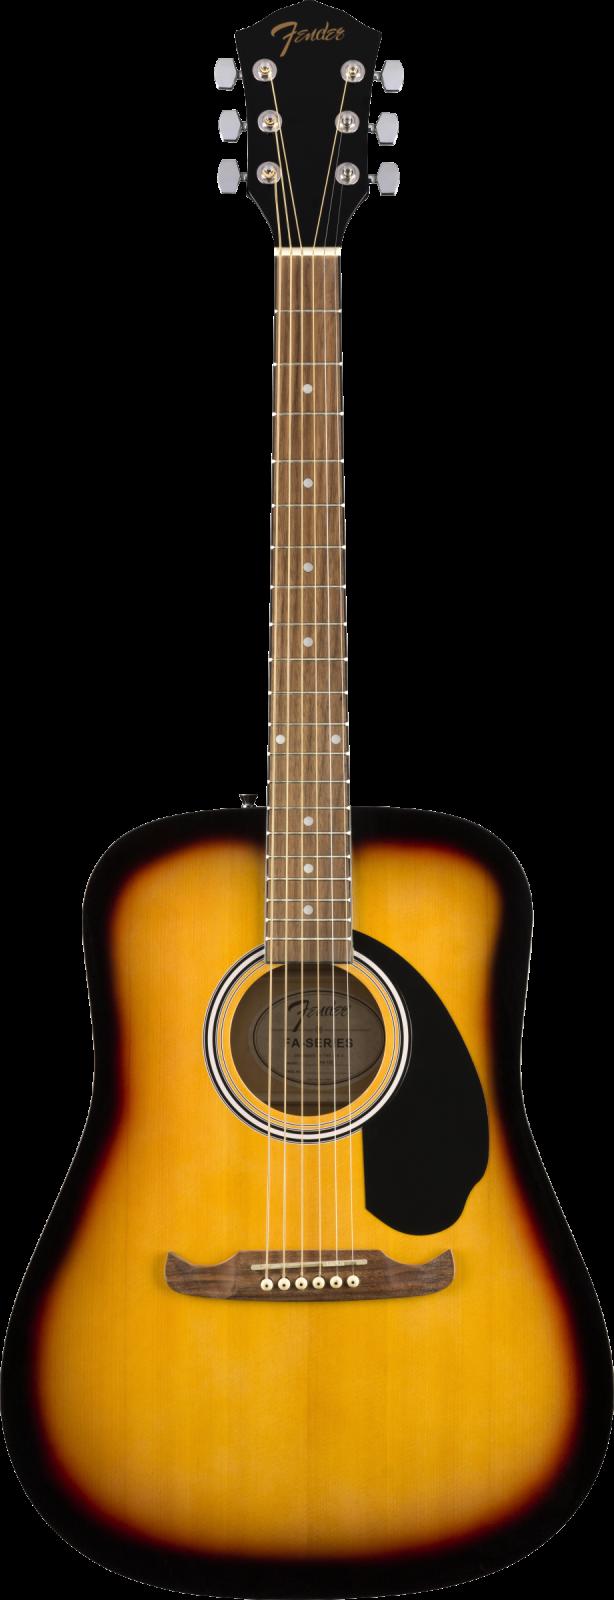 Fender FA-125 Dreadnought, Walnut Fingerboard, Sunburst